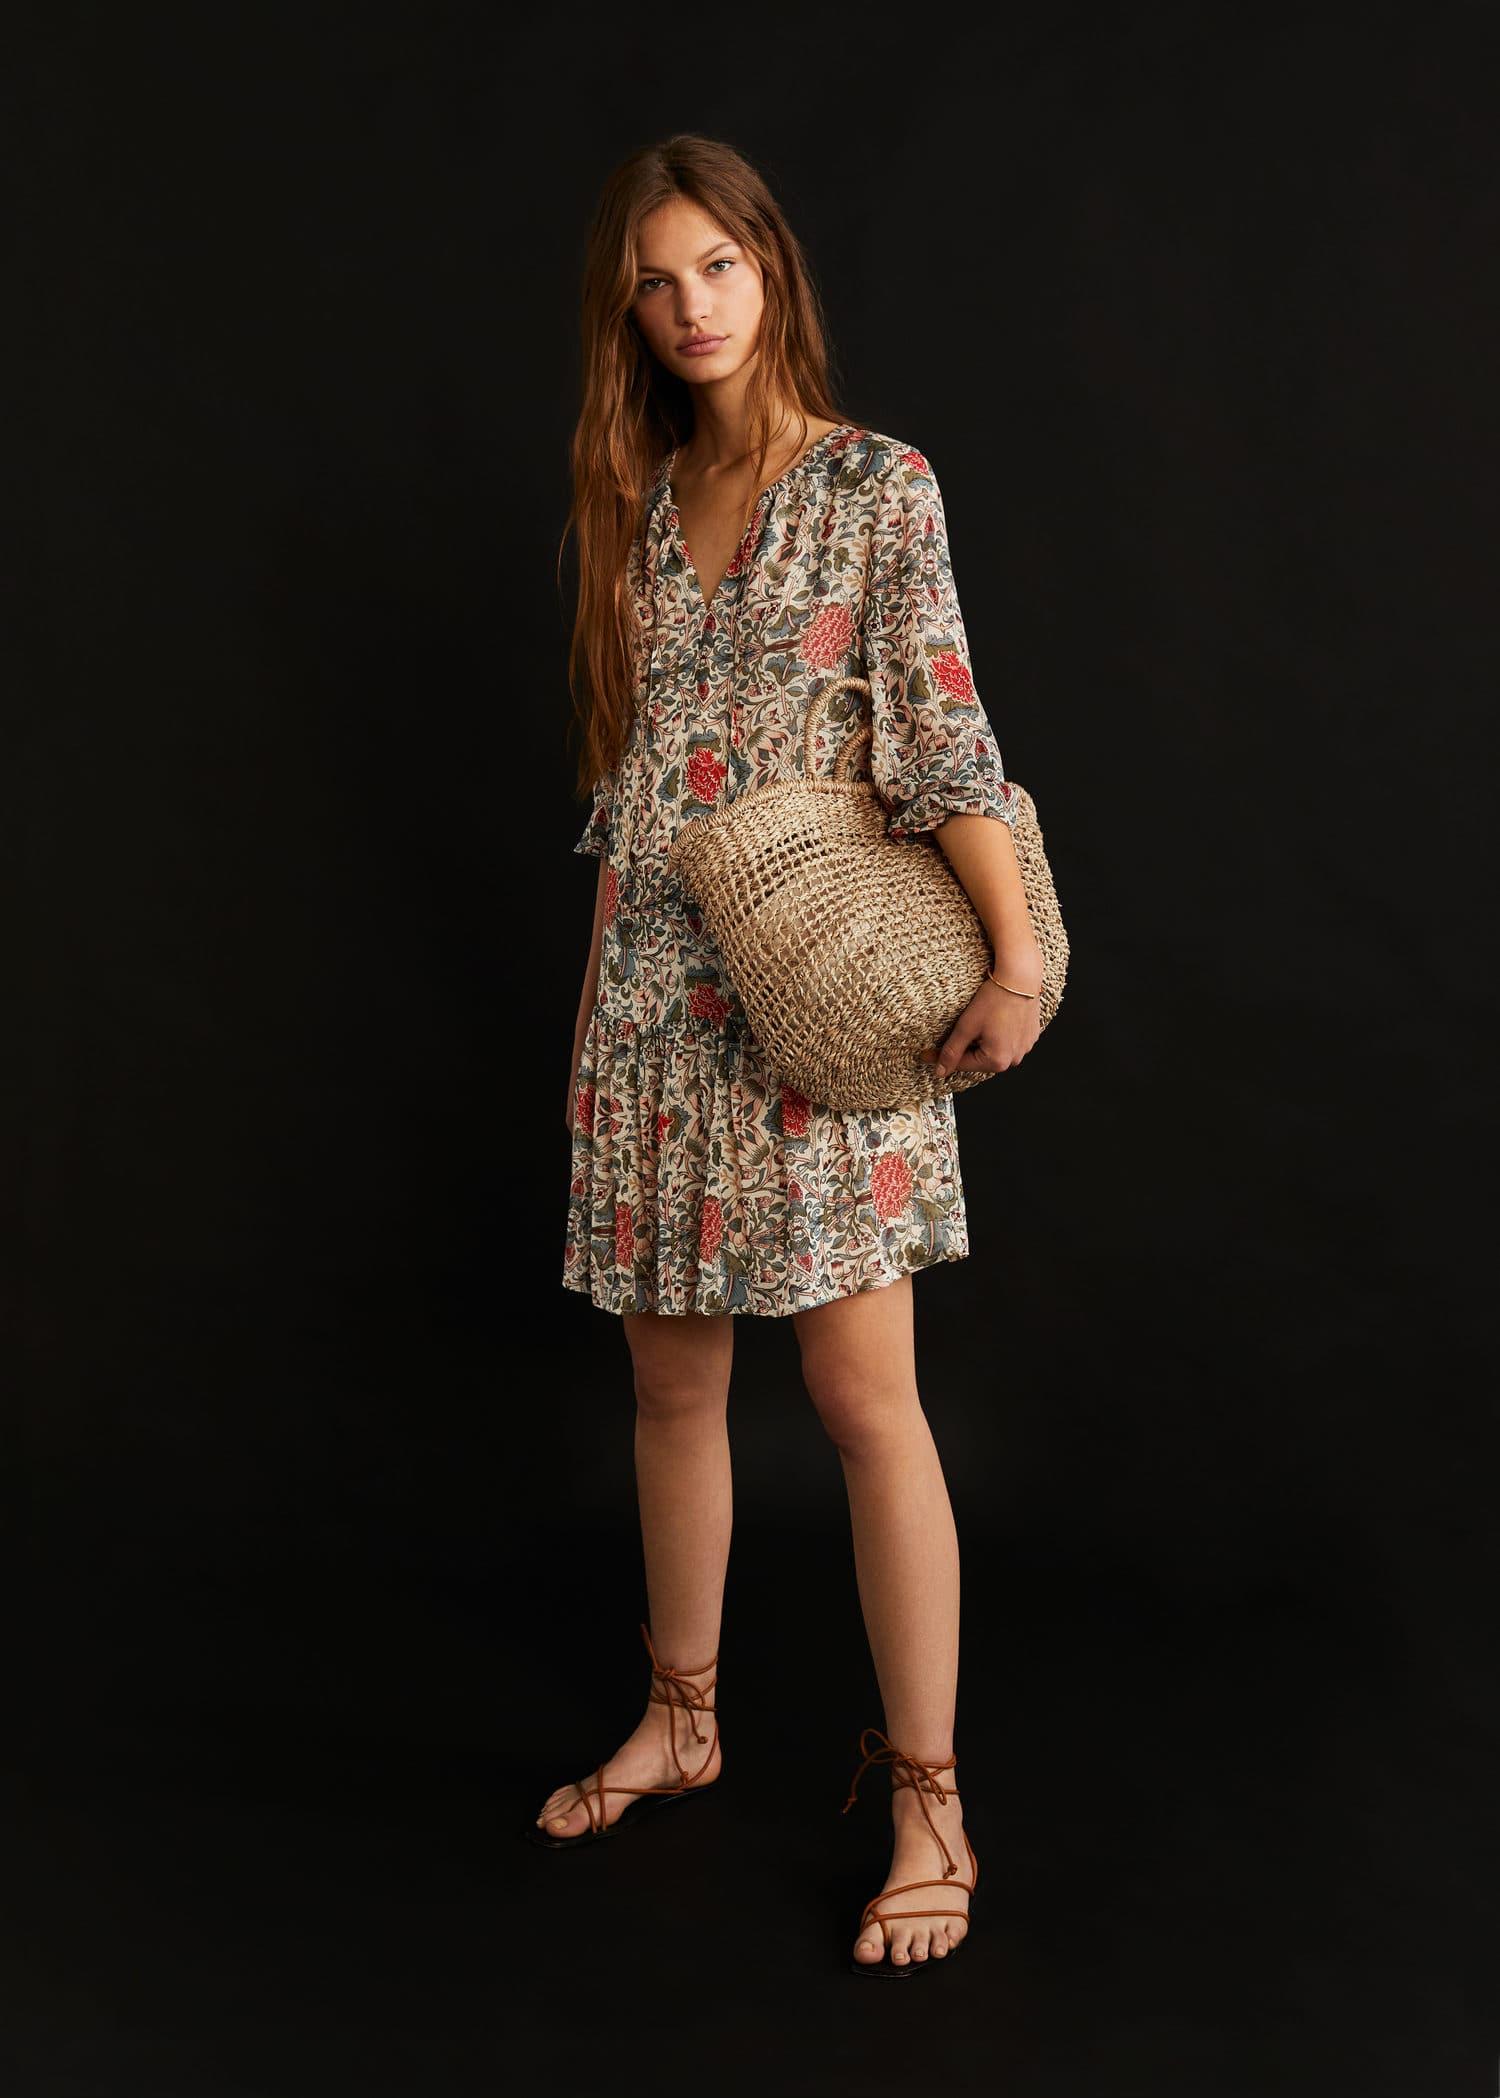 f7d9a63a9a Image Of Zara Uk Dresses Mini Womens Mini Dresses New Collection ...